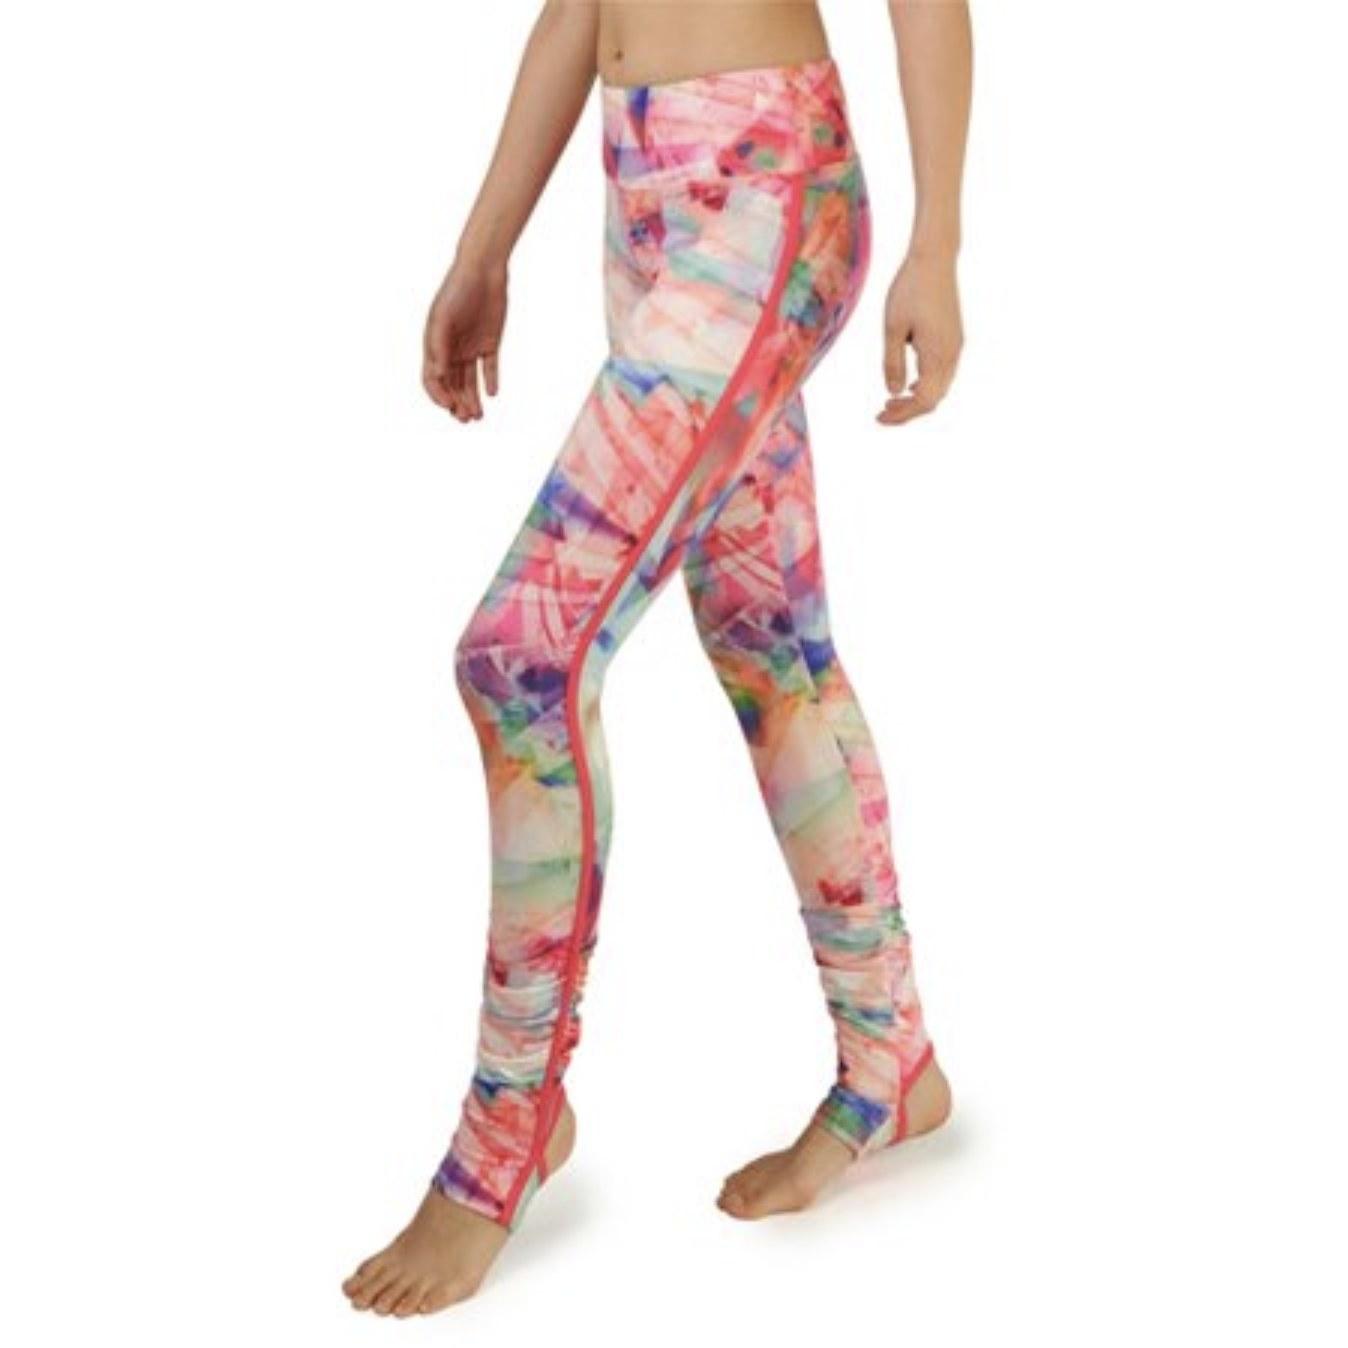 model wearing multi-colored leggings